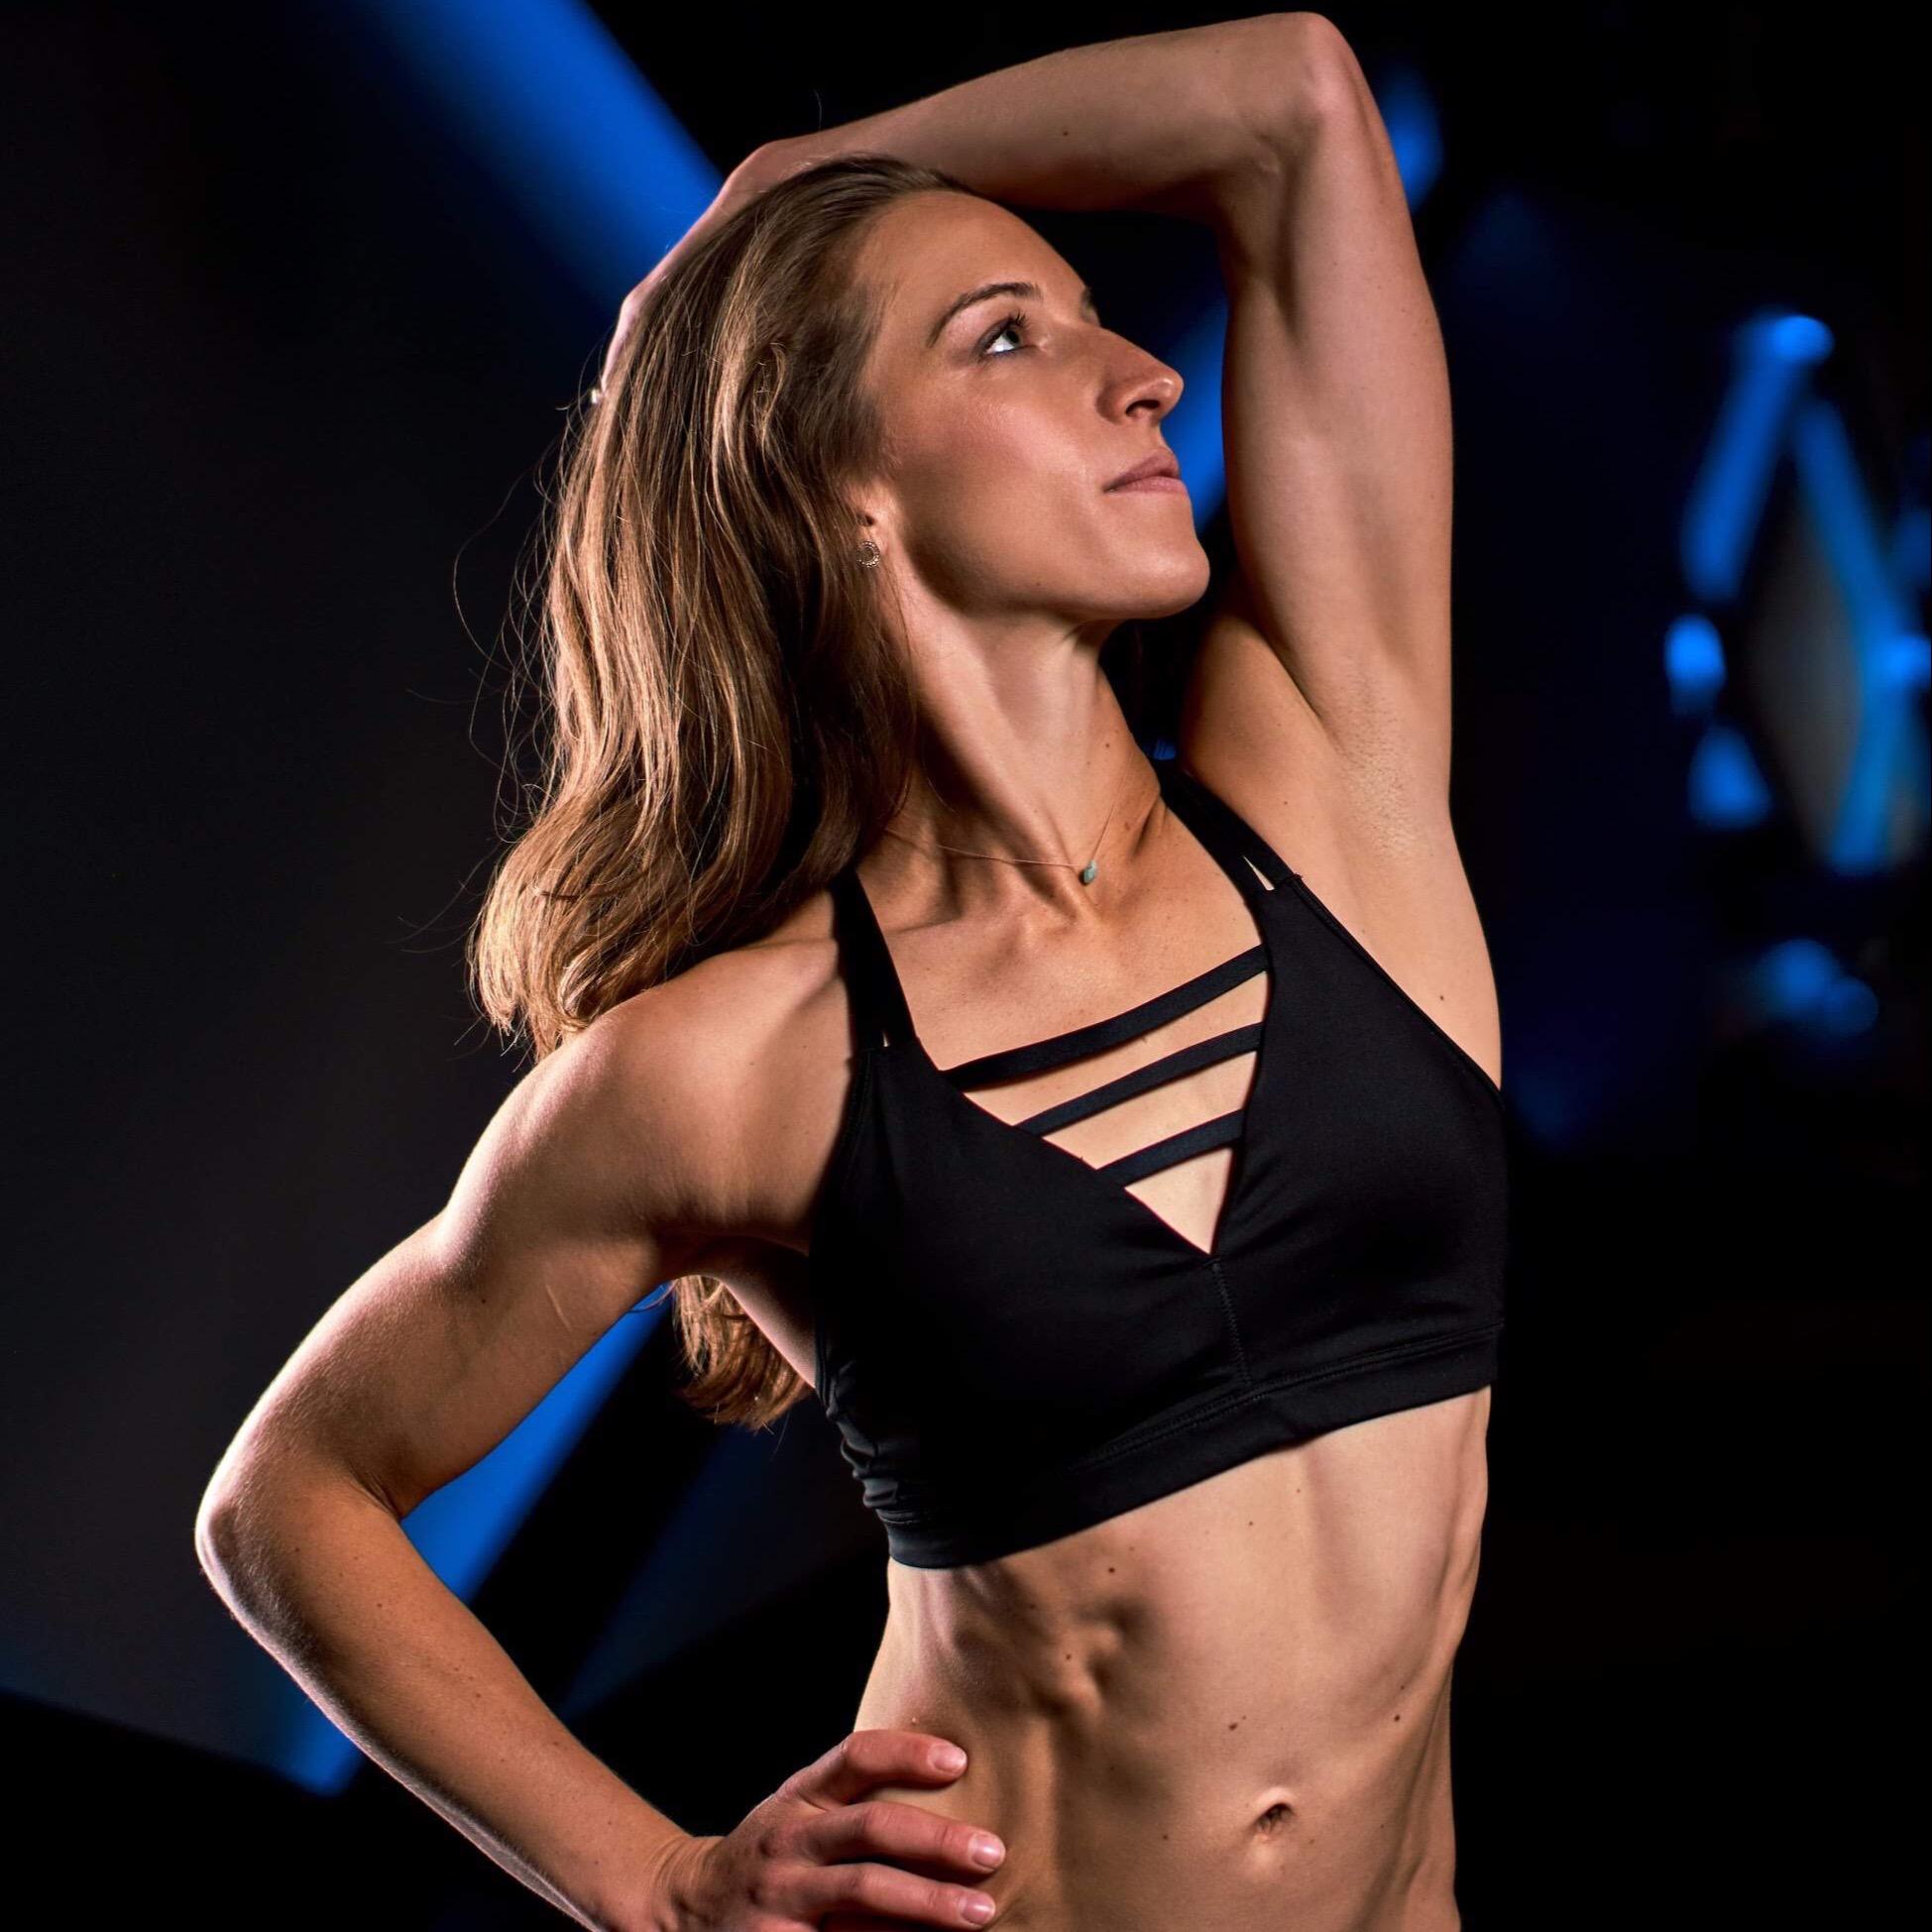 @Jhall_dancefit Profile Image   Linktree